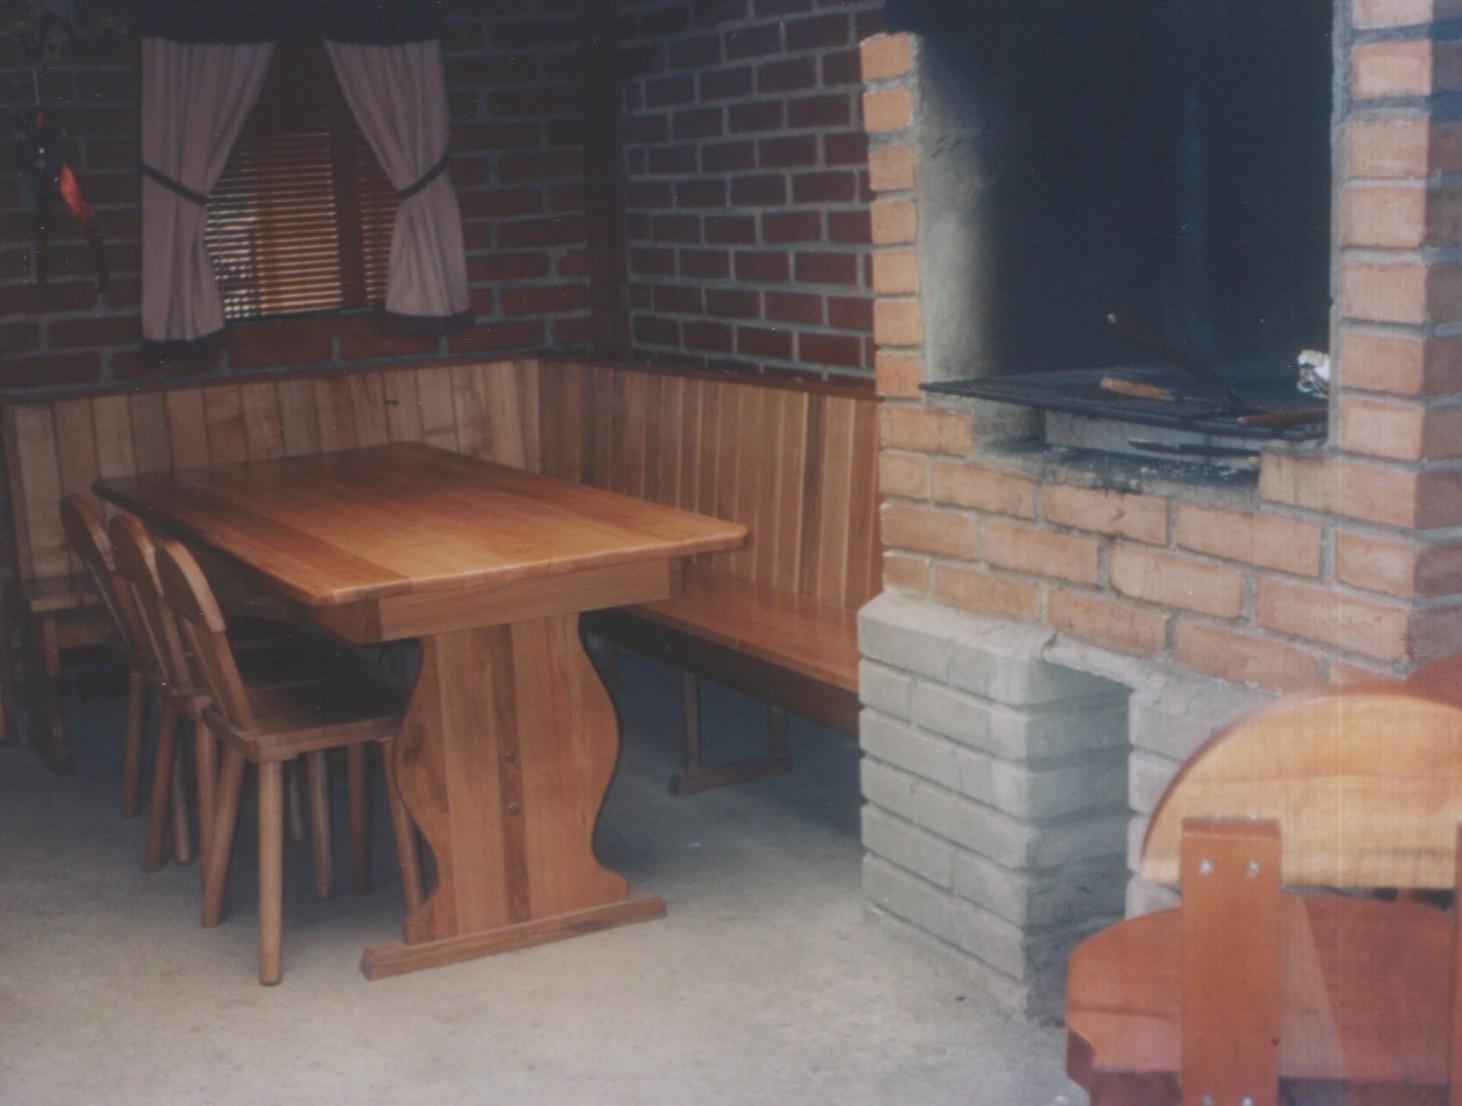 Muebles comedor diario cocina 20170804011835 for Comedores 8 sillas chile